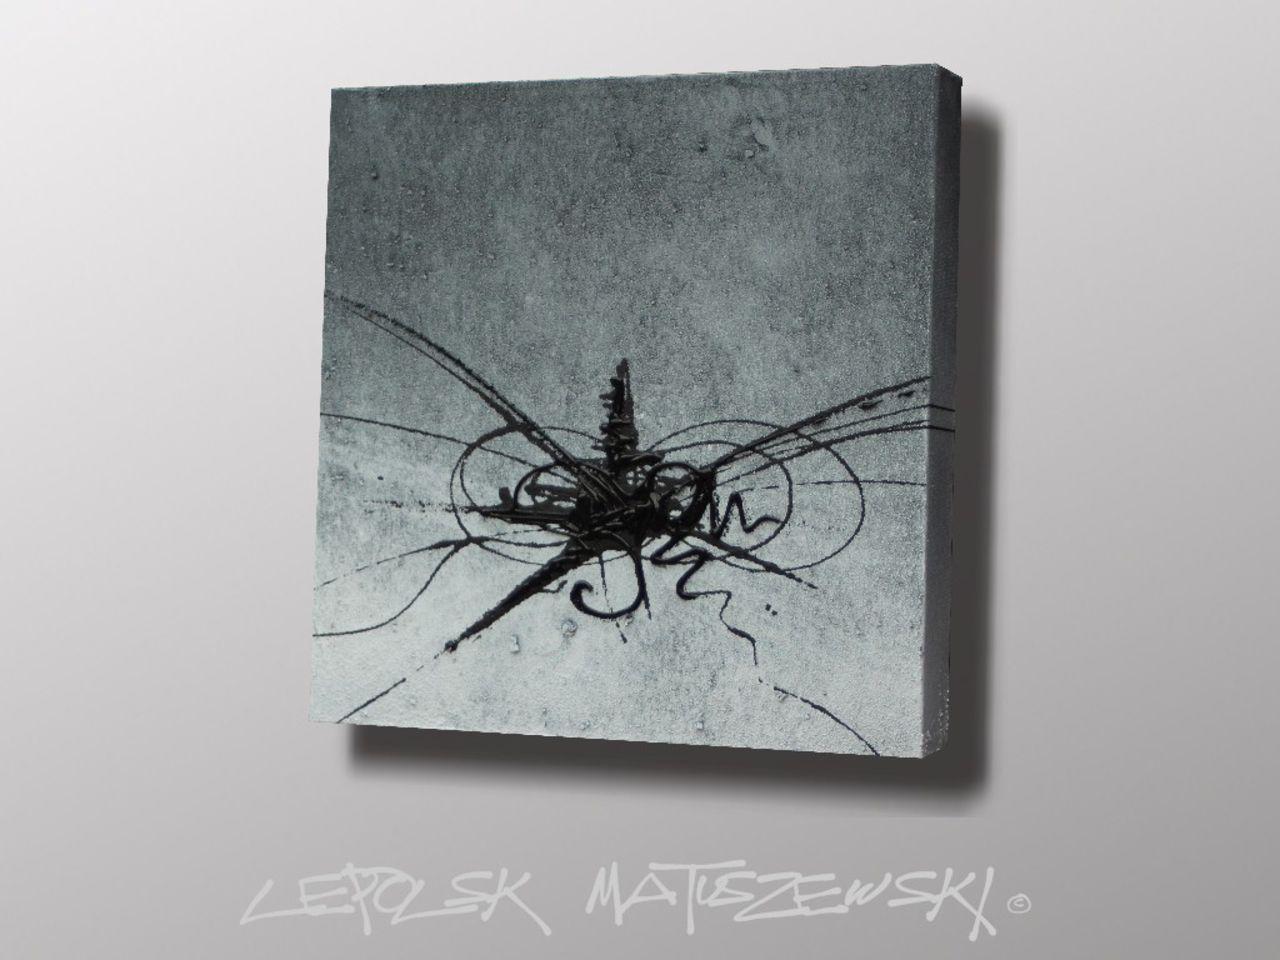 LEPOLSK MATUSZEWSKI BLACK STAR  de Lepolsk  Matuszewski